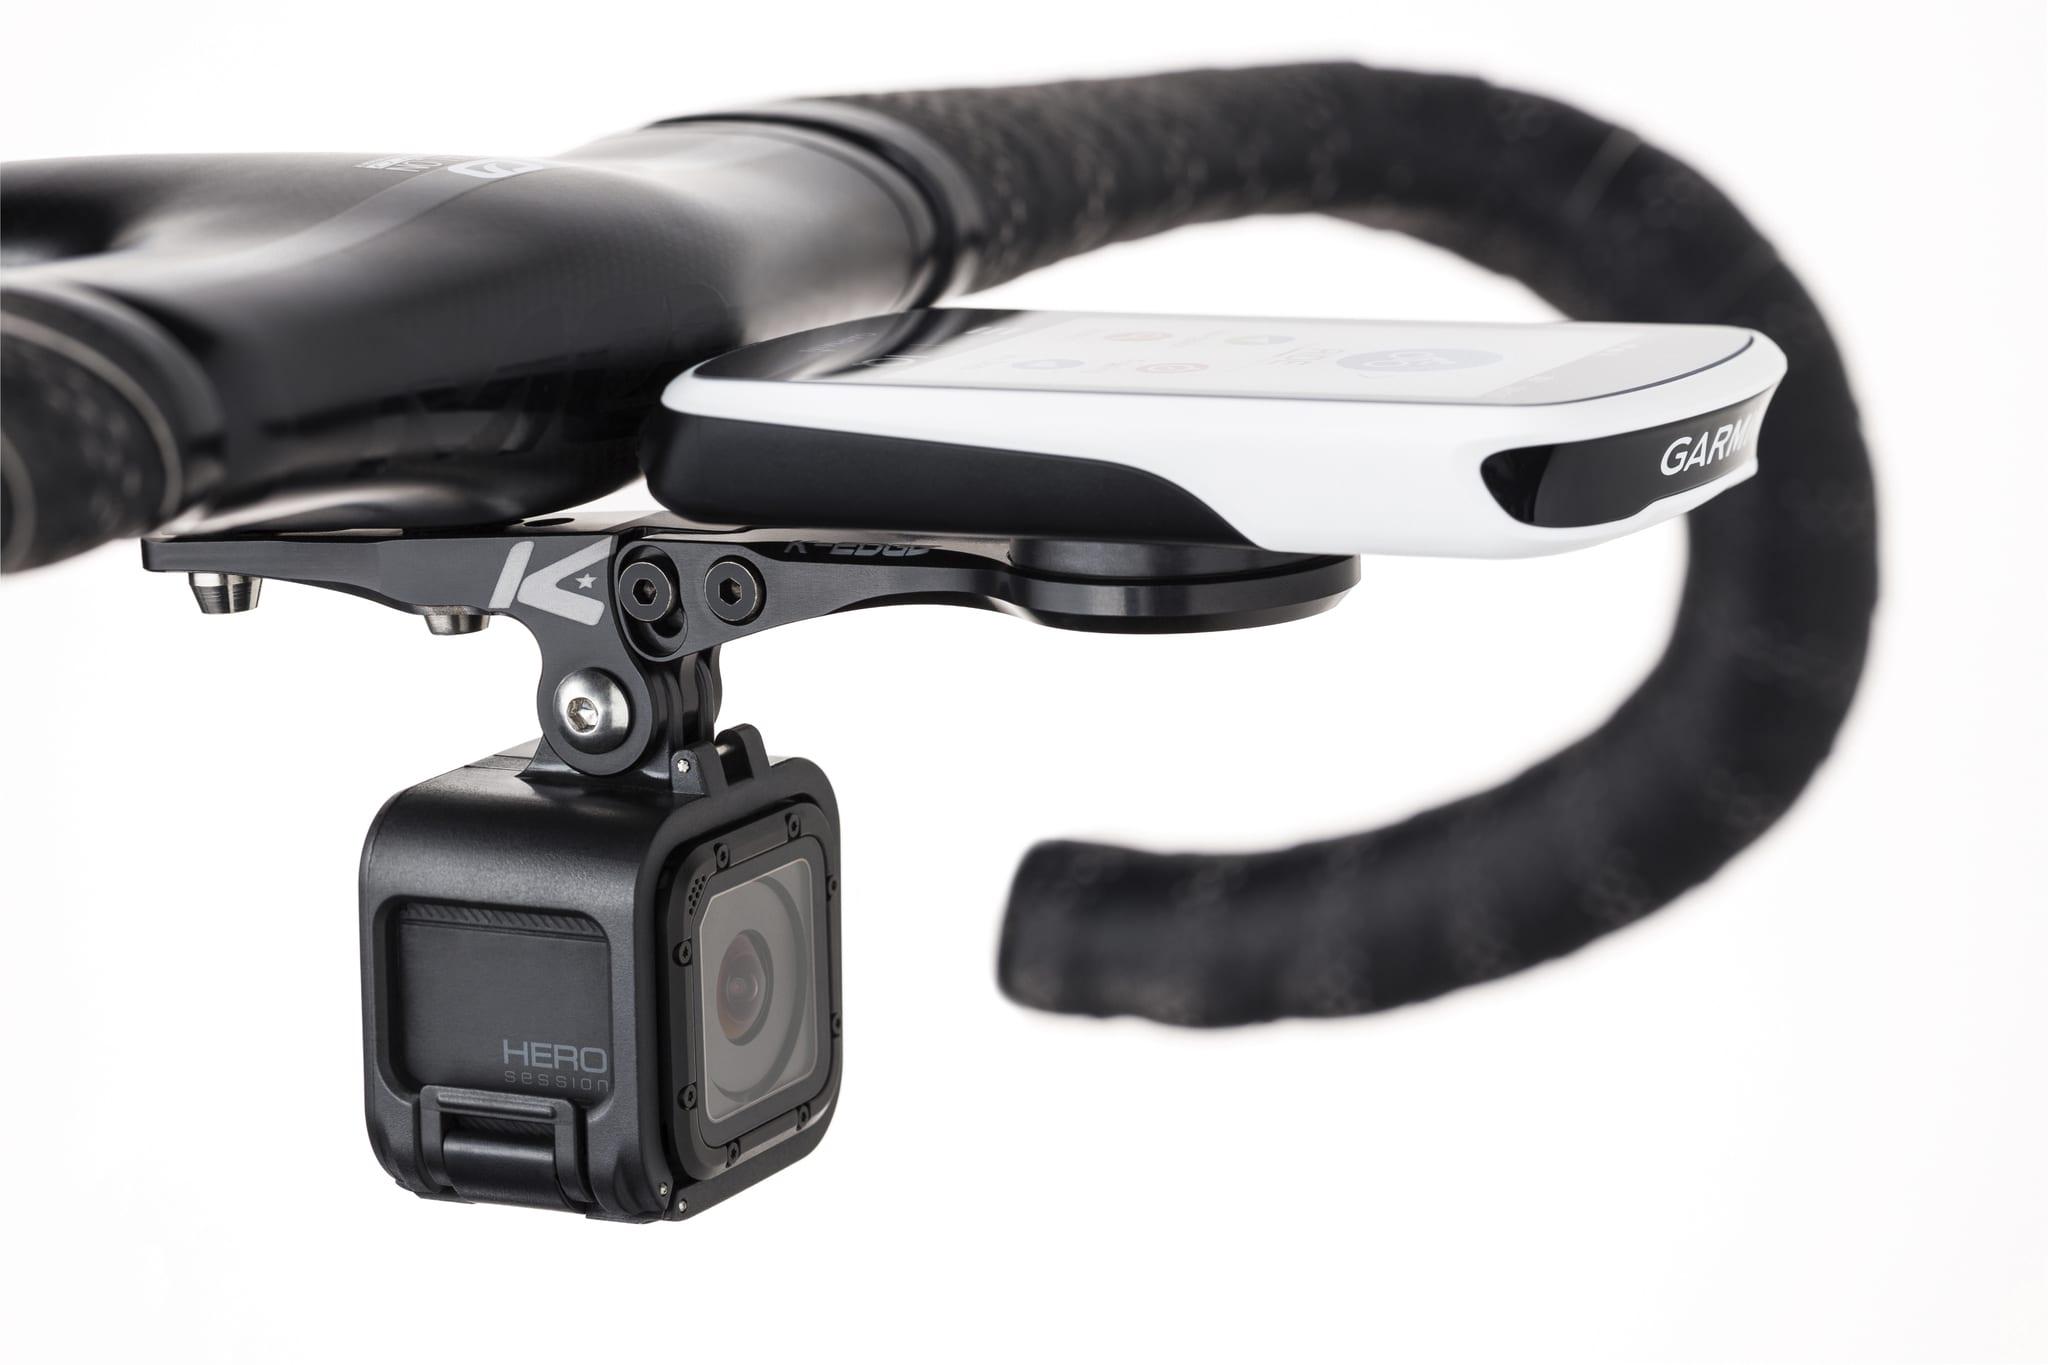 Pro Camera Bracket Integrated Mount Black